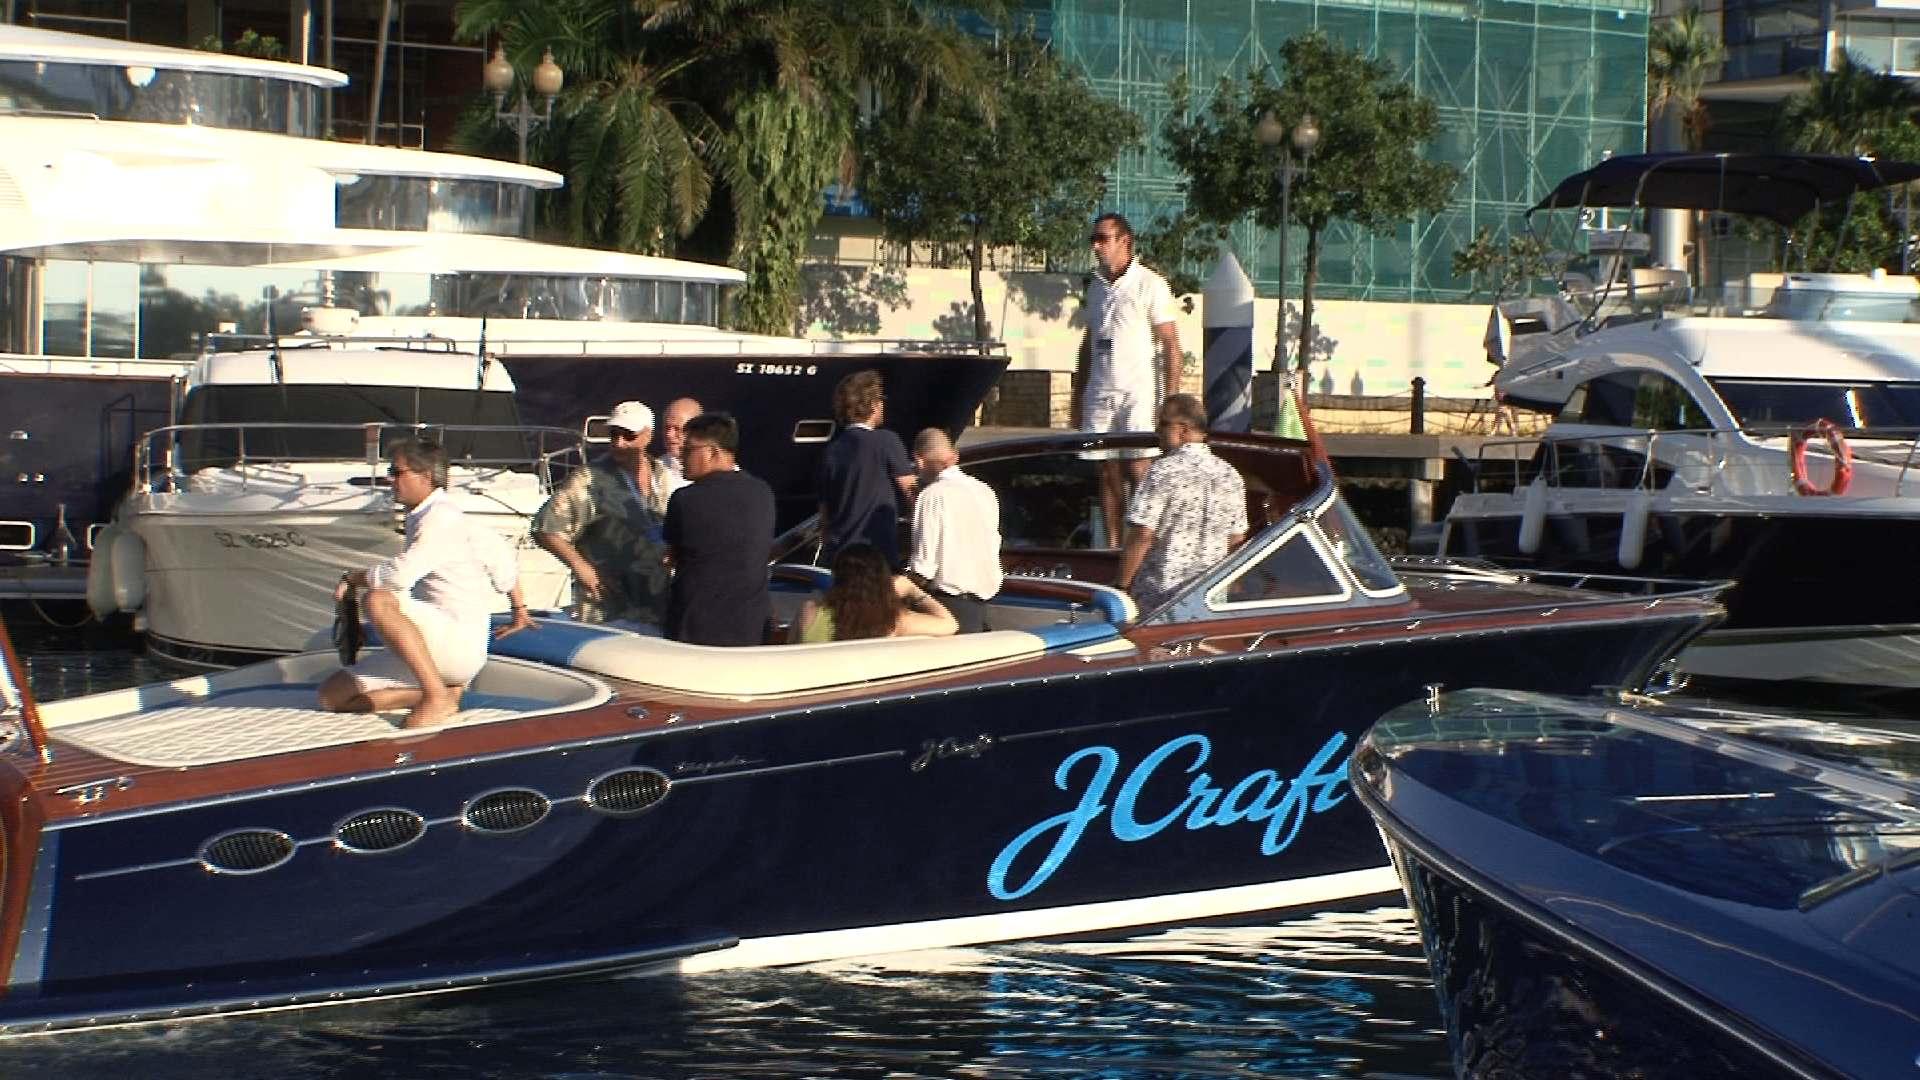 2012 Singapore Yacht Show – J Craft Torpedo